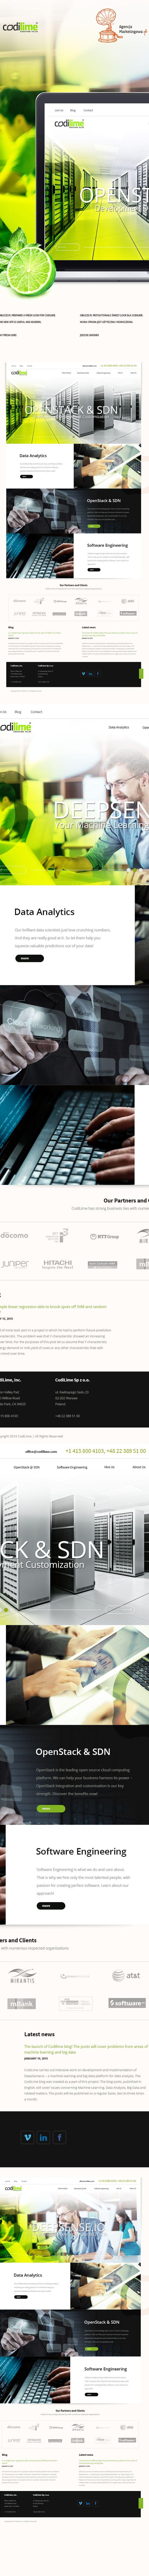 Lime look web-design :) on Behance